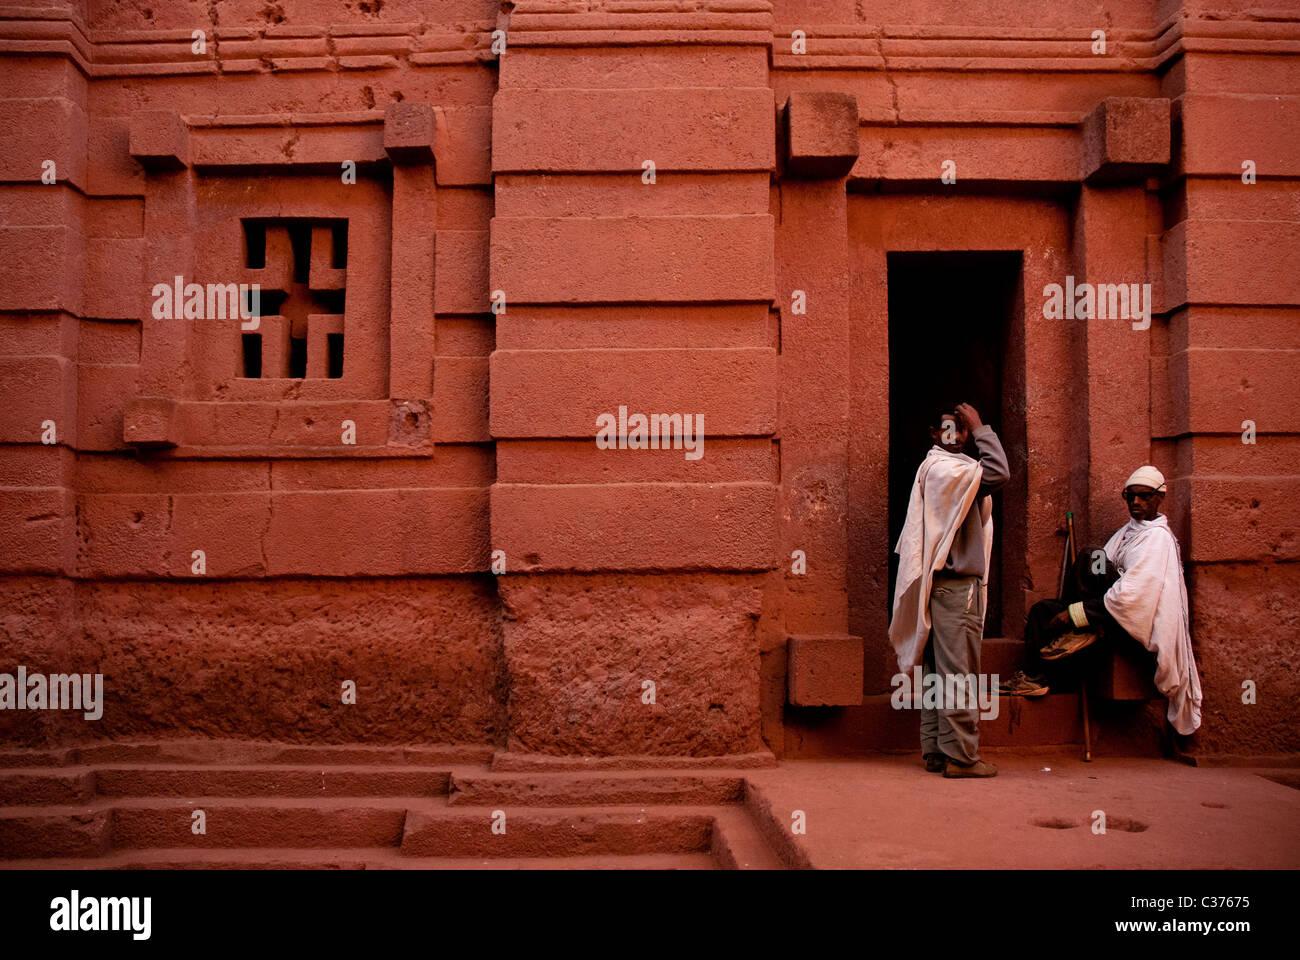 guards at lalibela rock hewn church in ethiopia - Stock Image